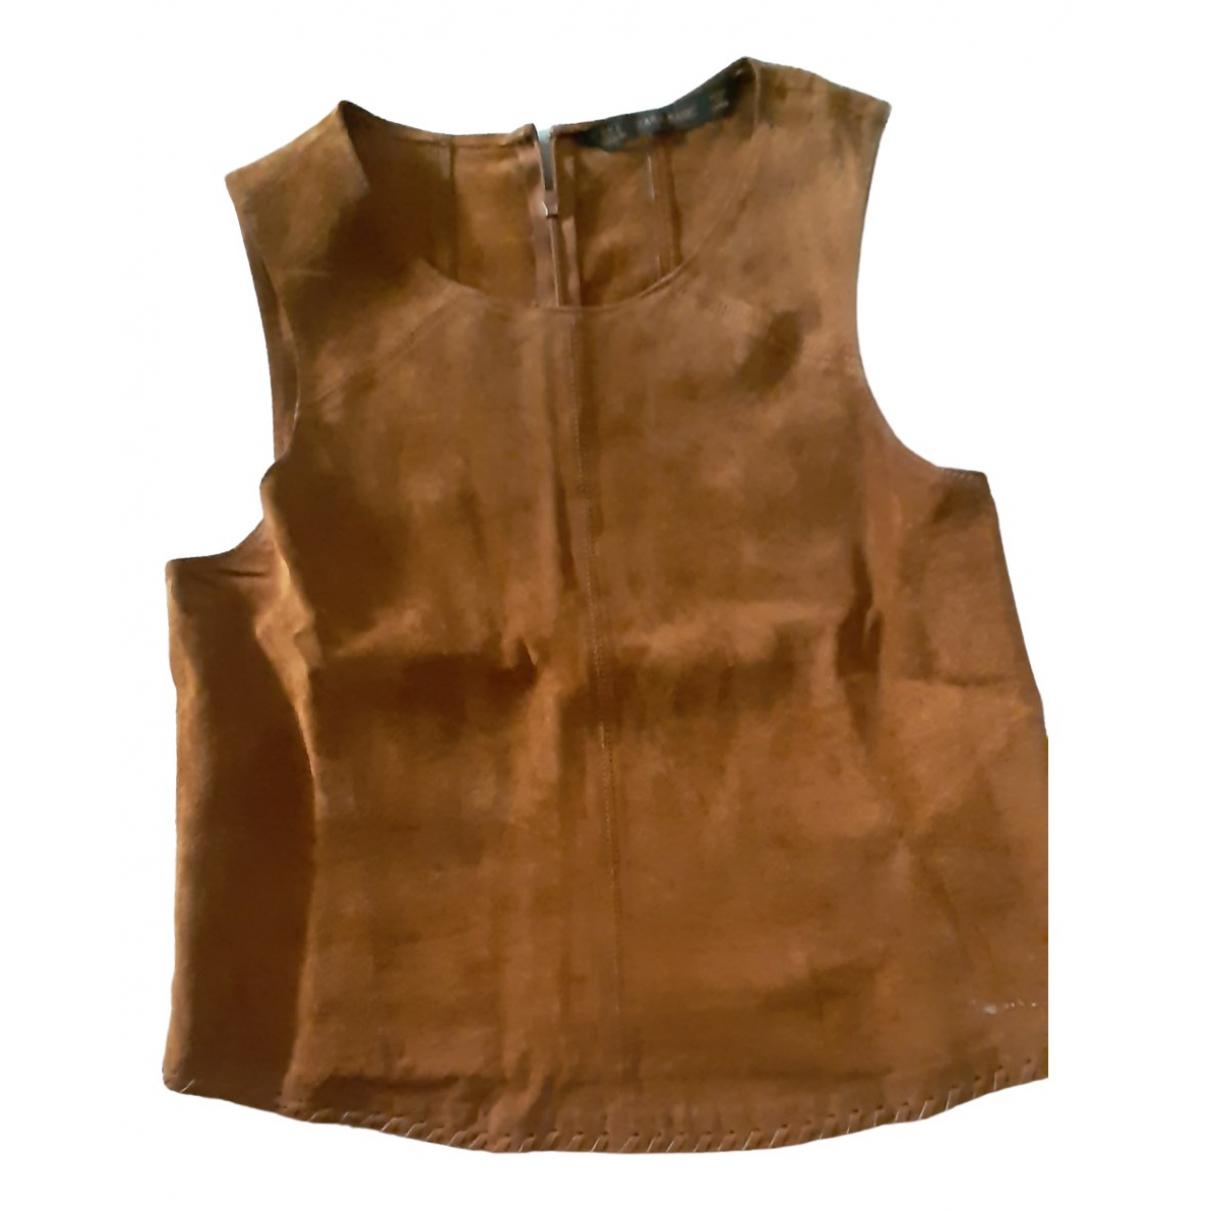 Zara - Top   pour femme en cuir - marron